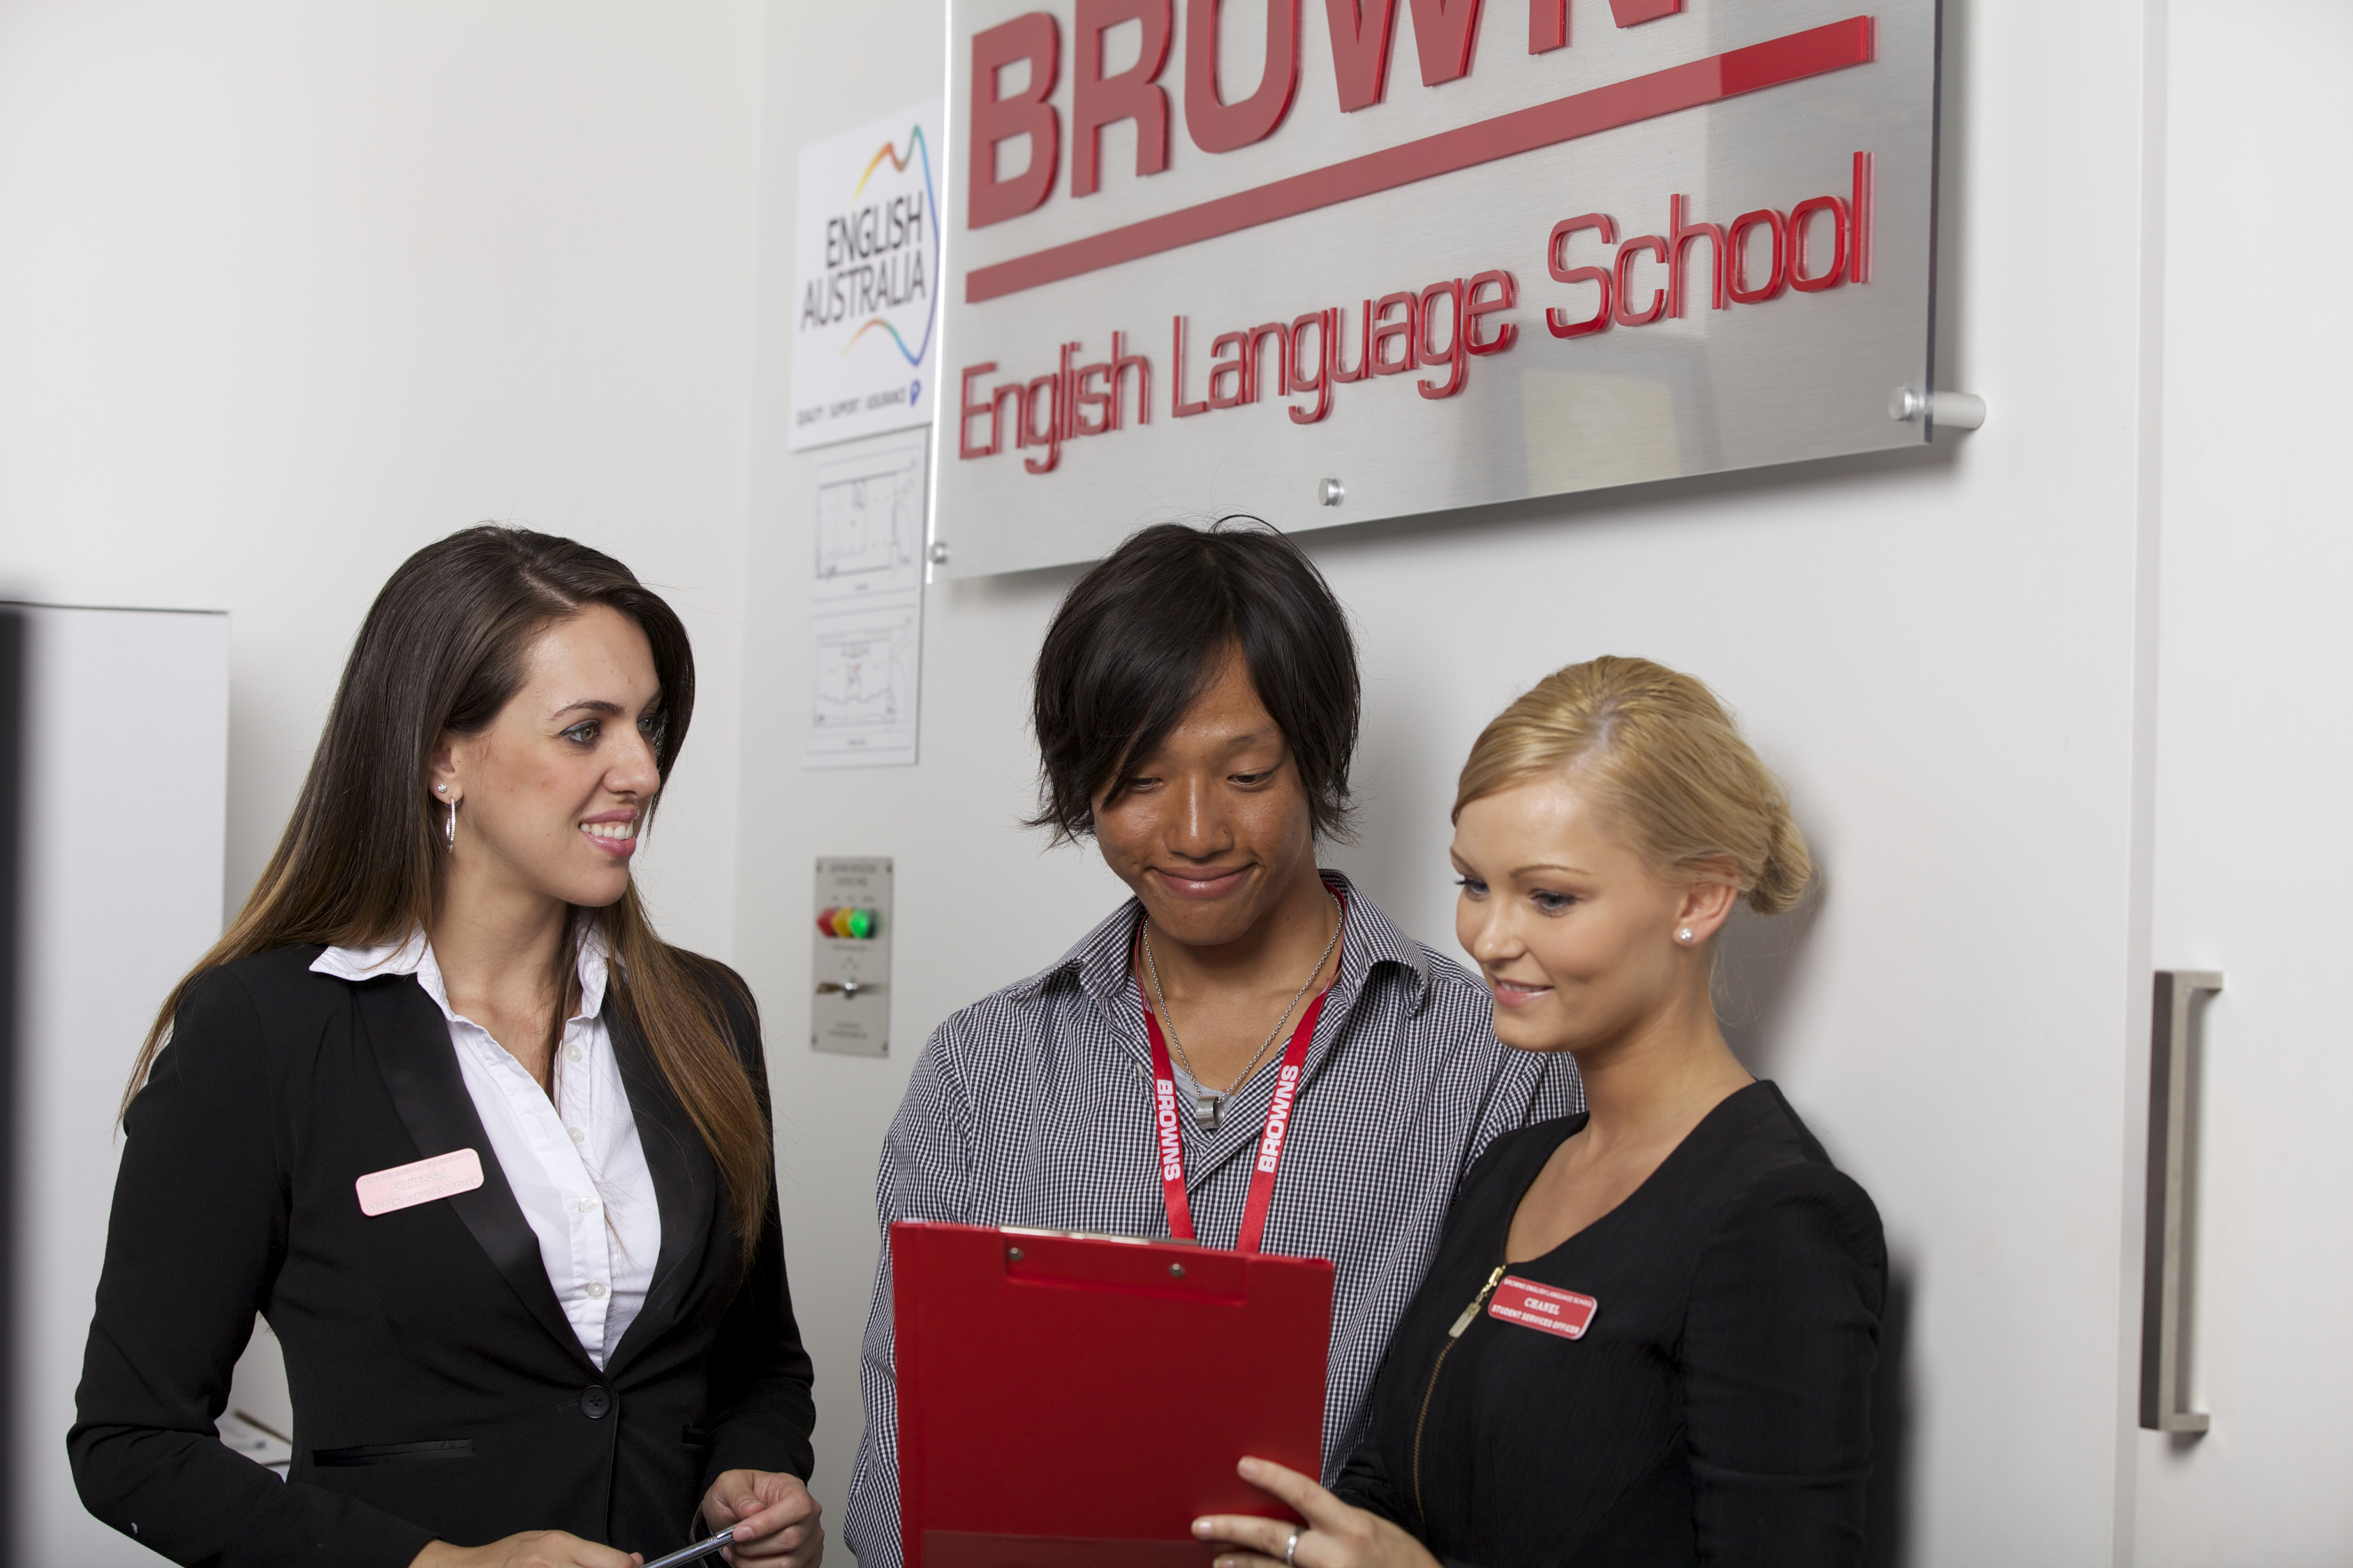 BROWNS English Language School Gold Coast Campus